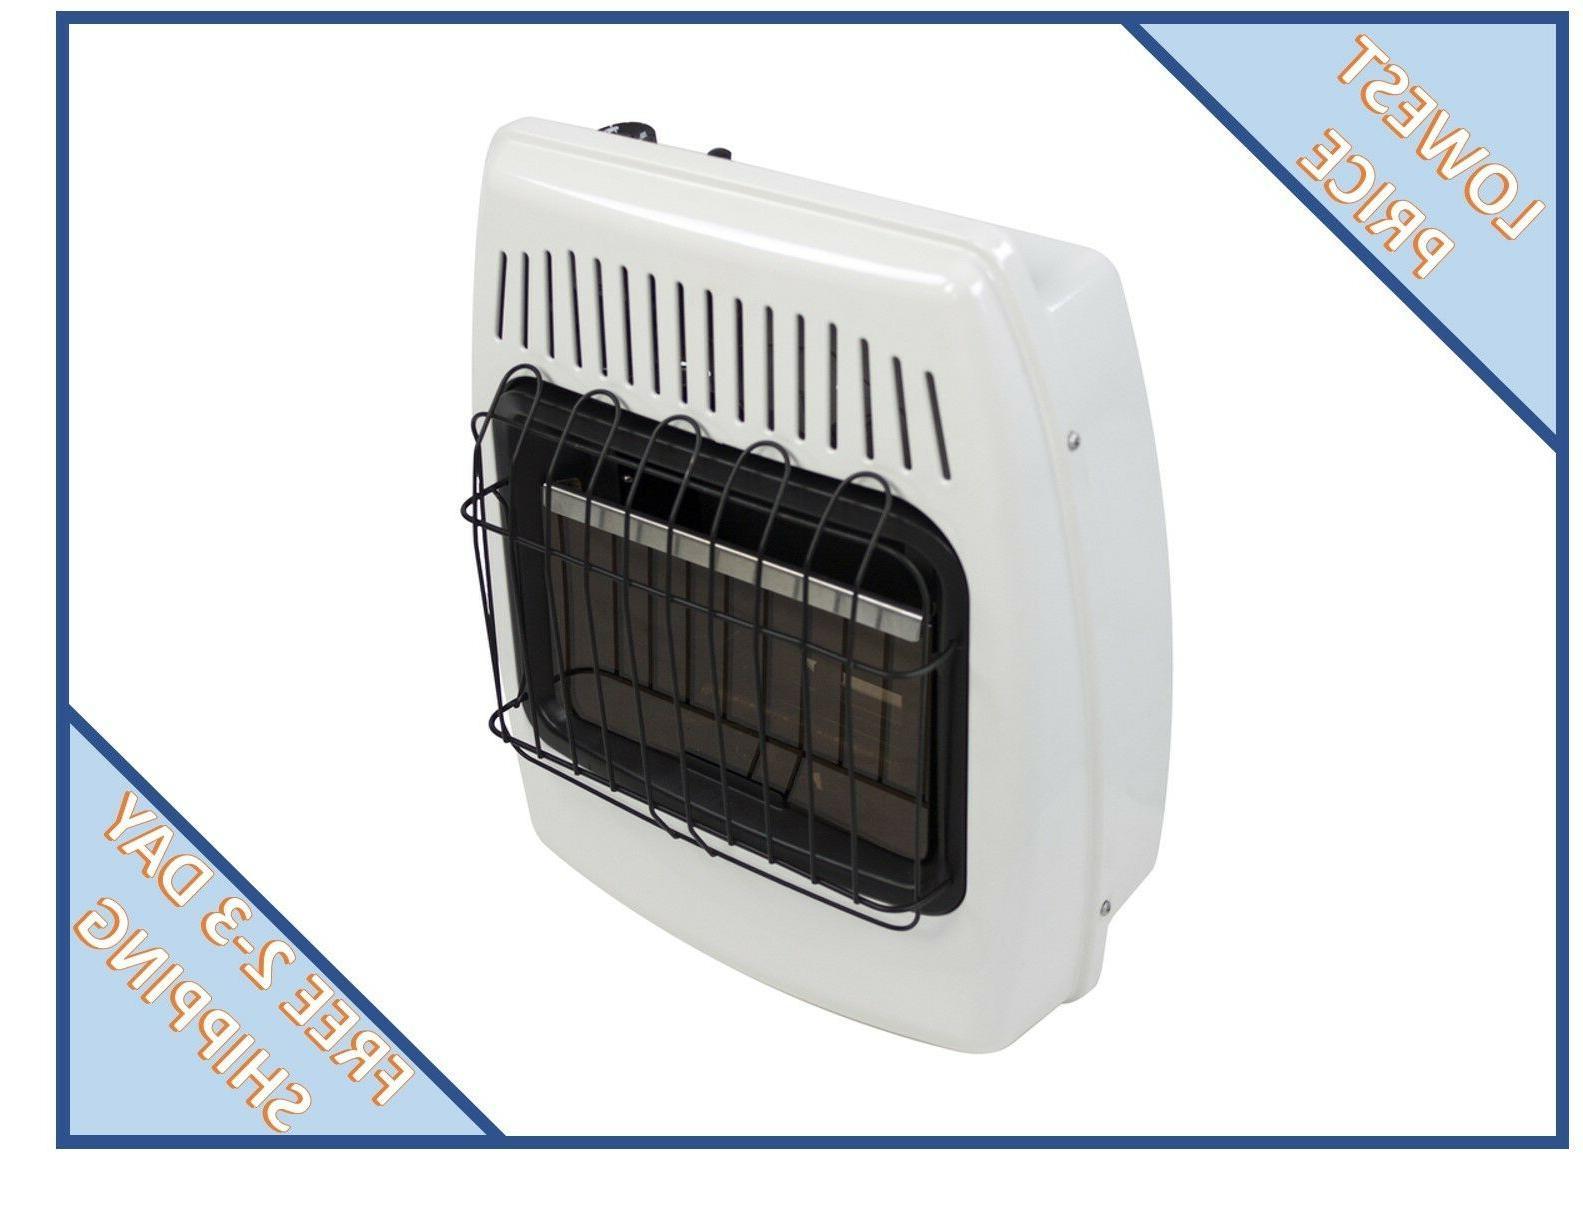 Dyna-Glo Liquid Heater